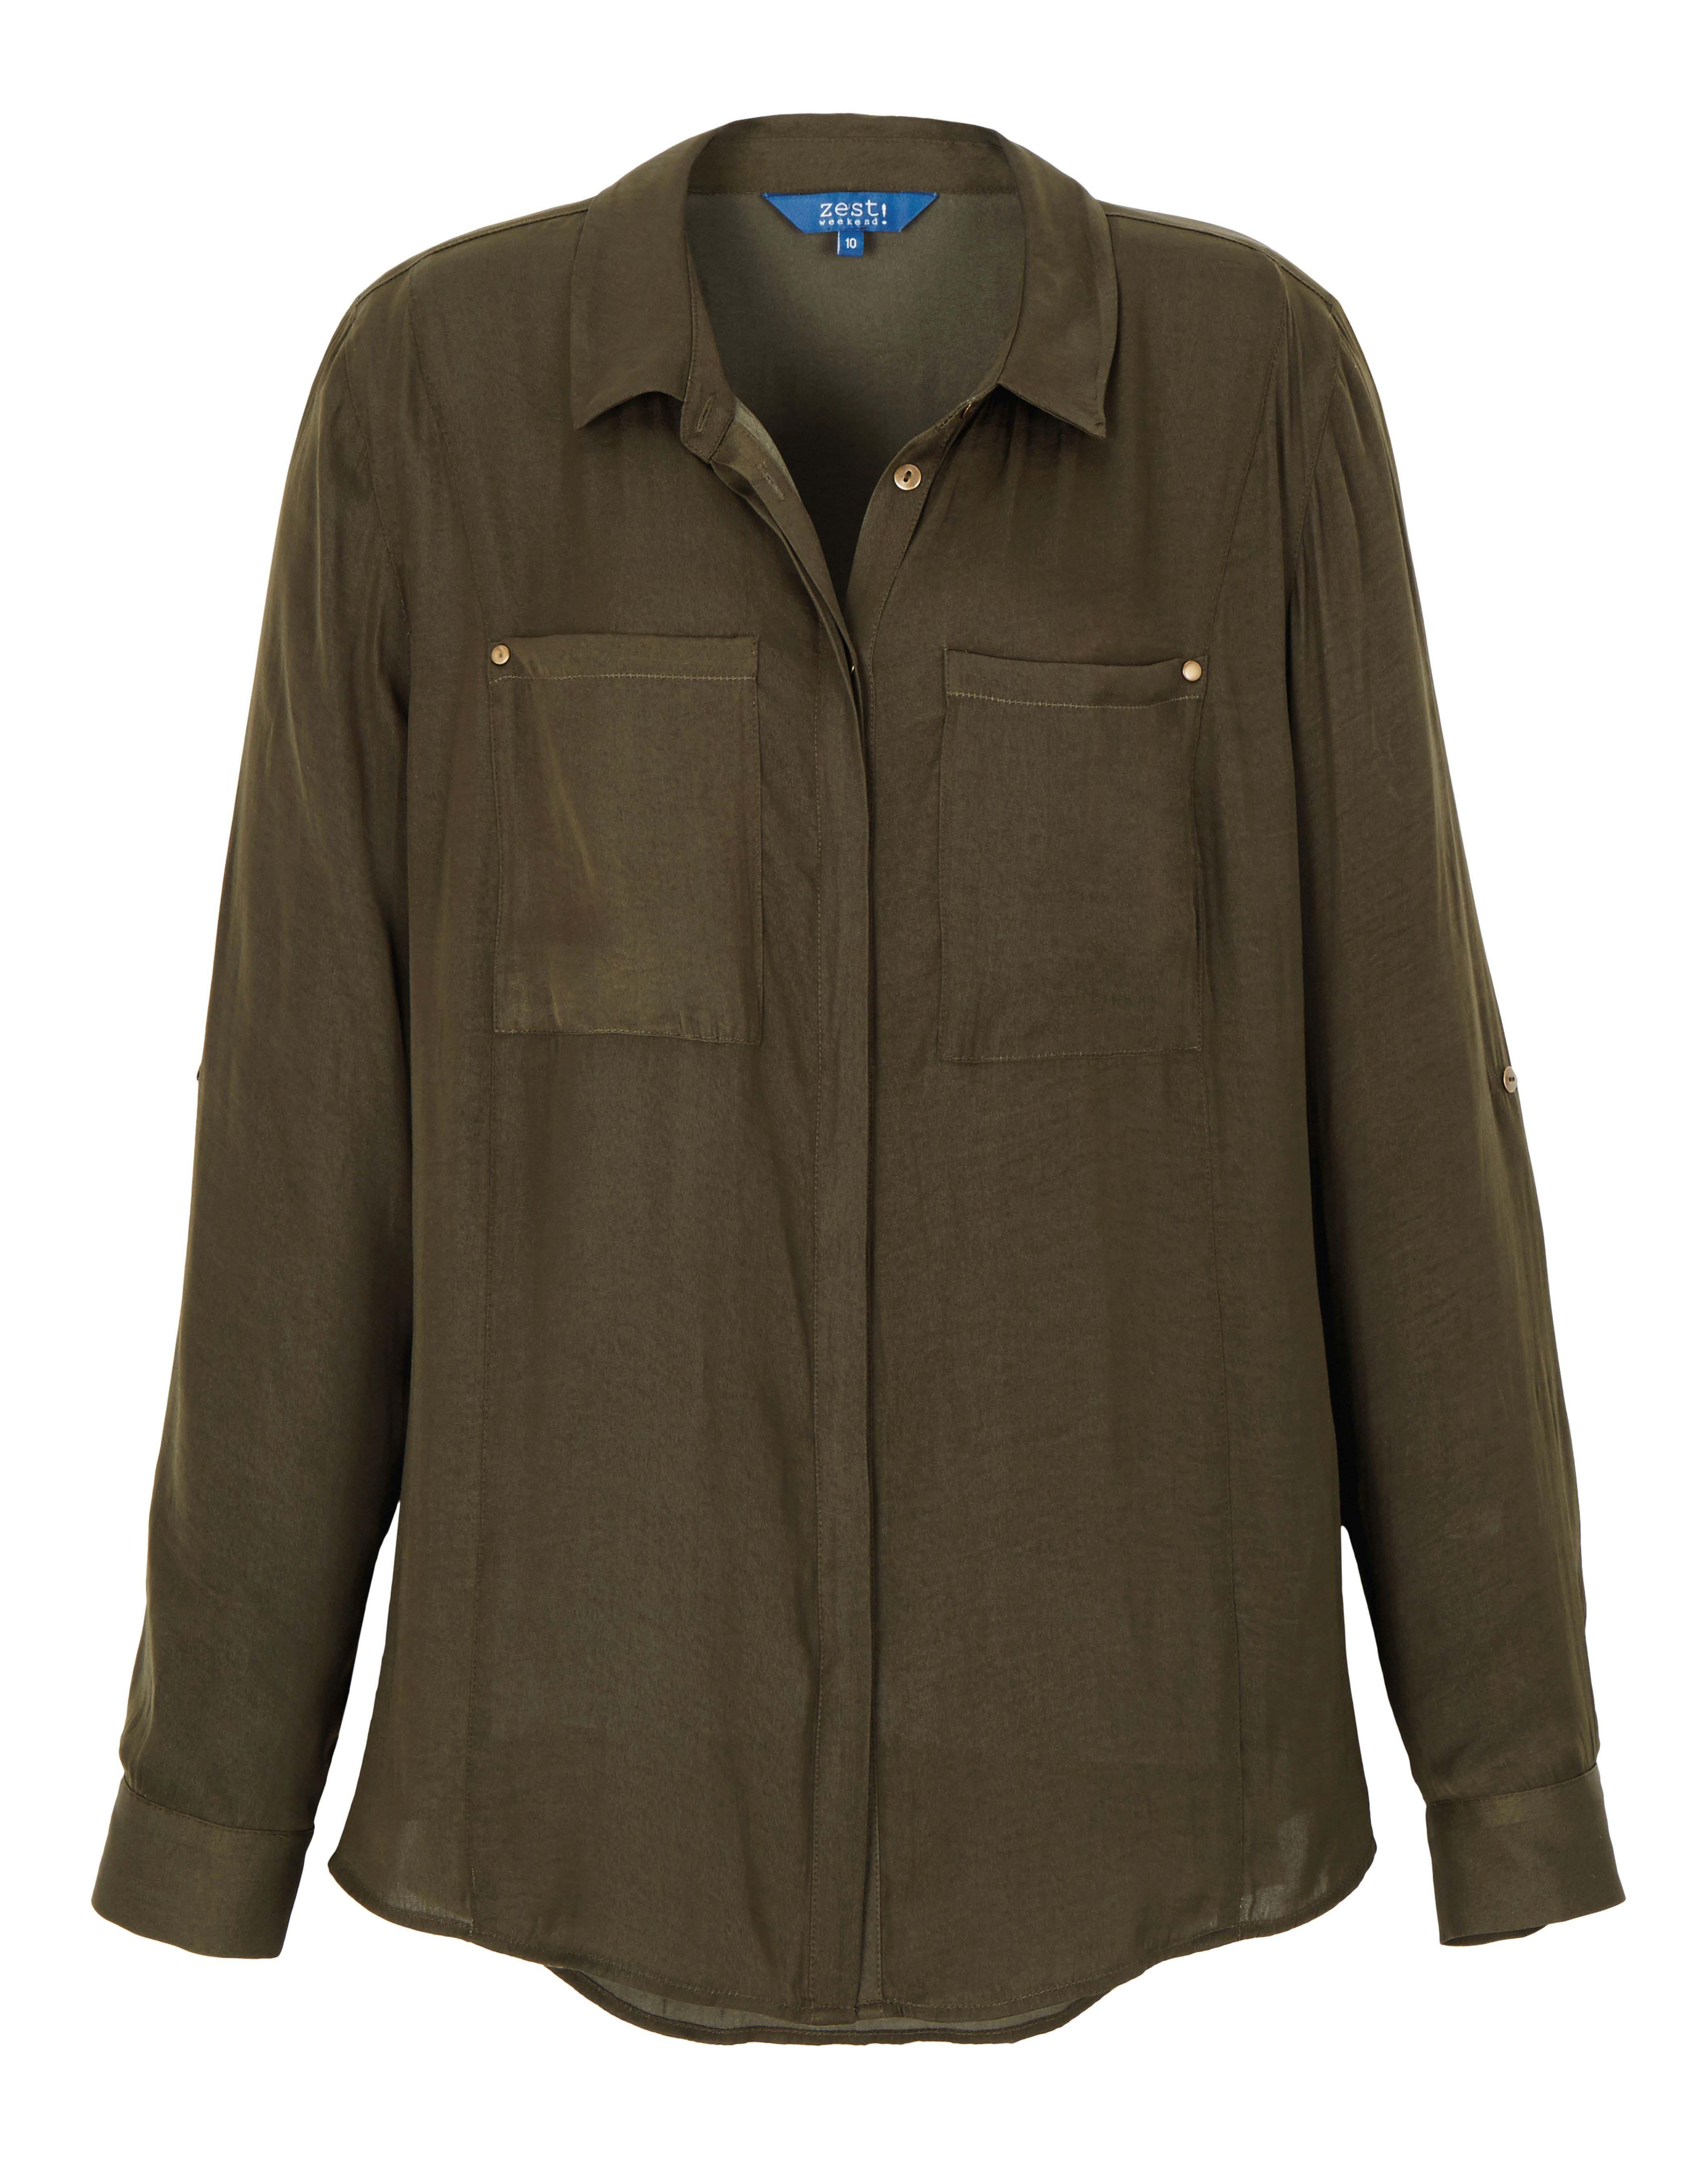 6085105 Zest Weekend Lobgline Peached Shirt $59.99 Feb 18 2016